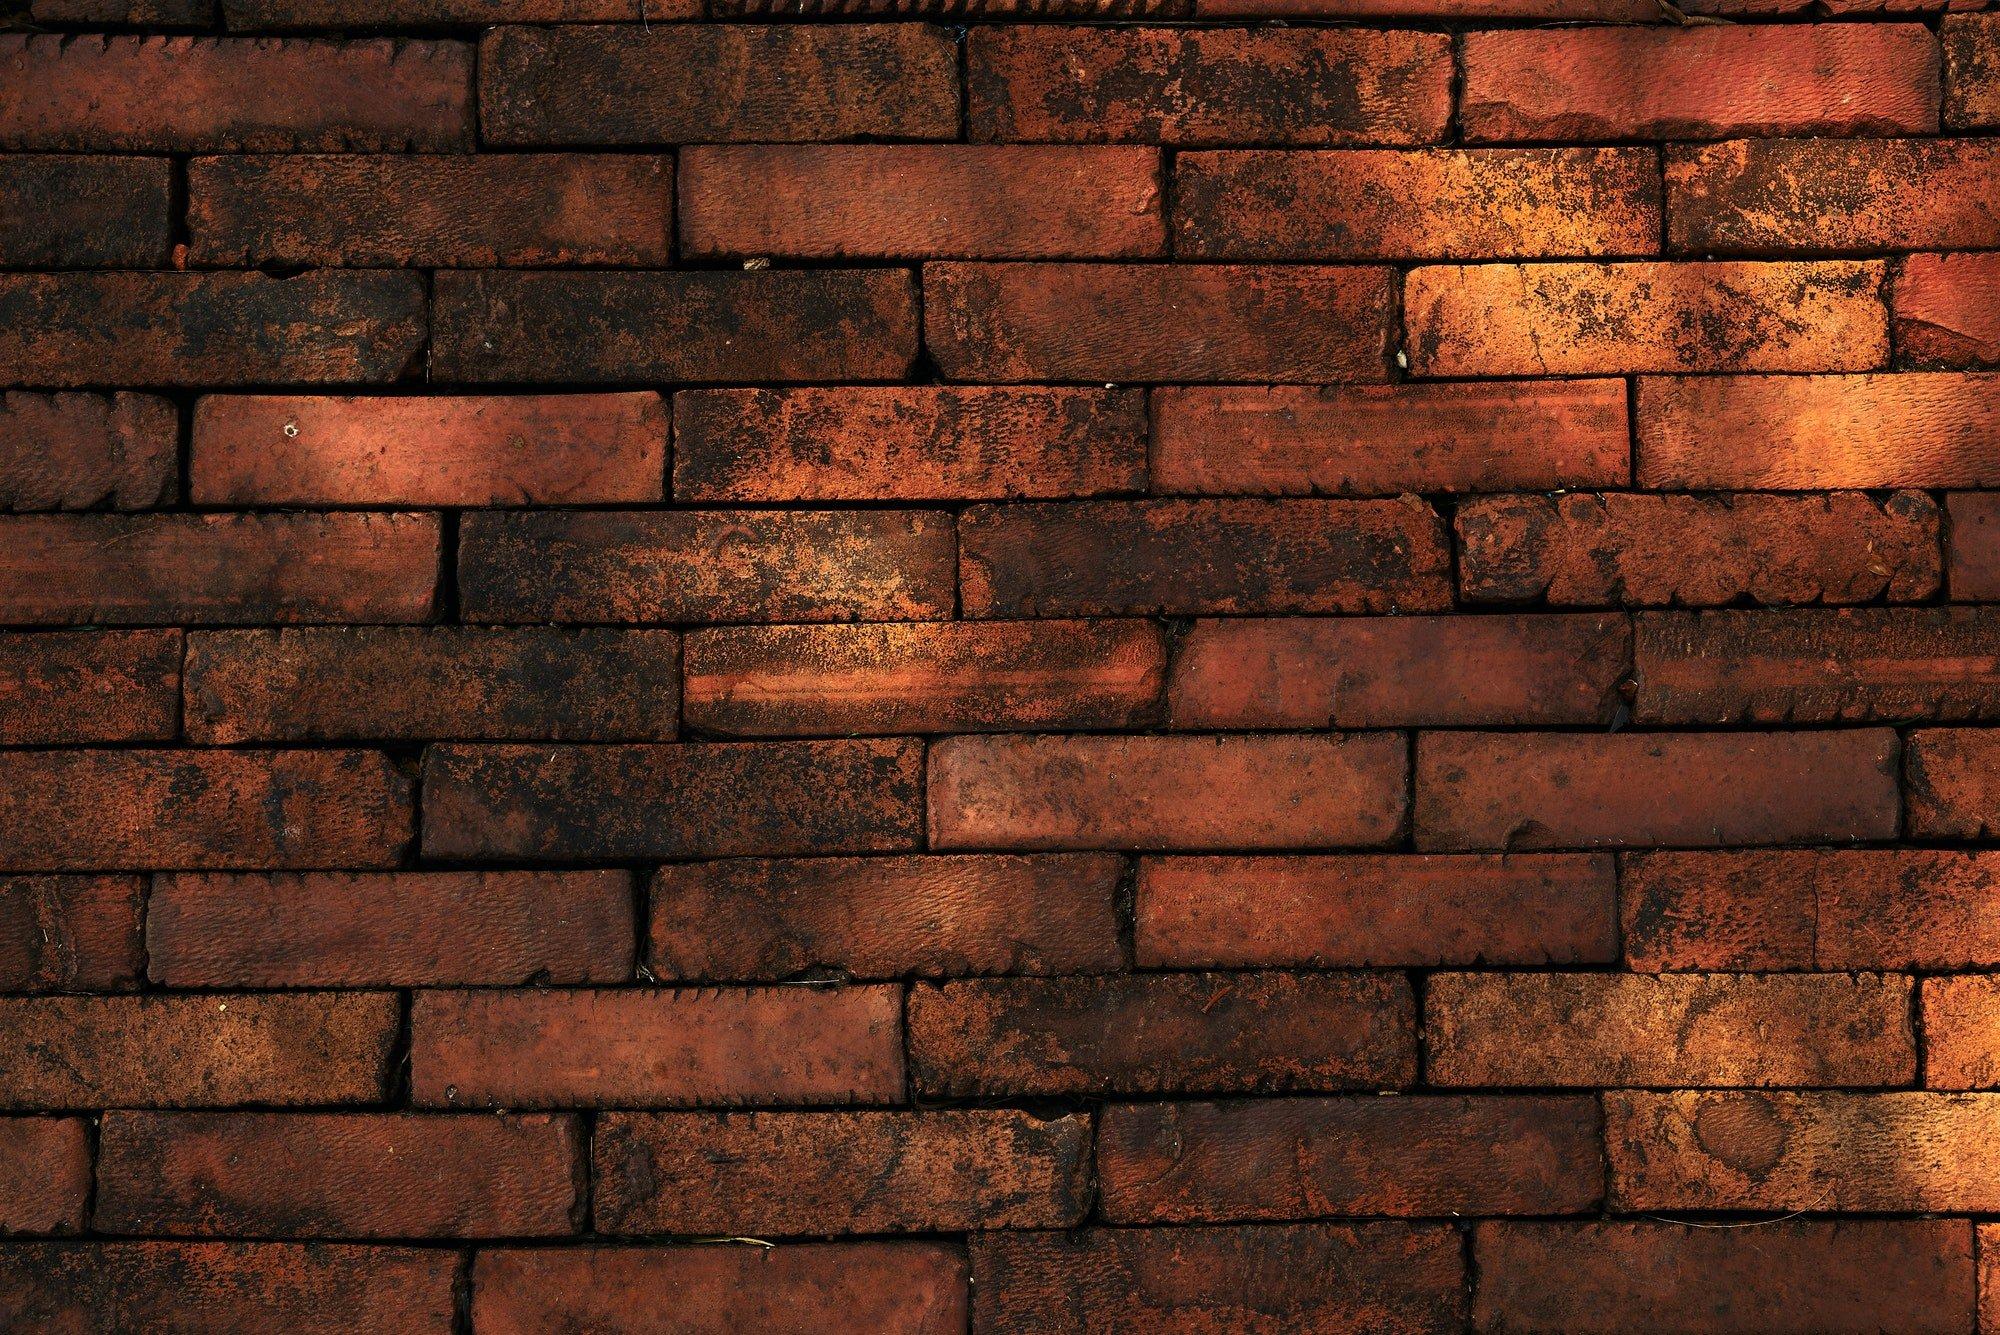 Background of the rough orange brick wall